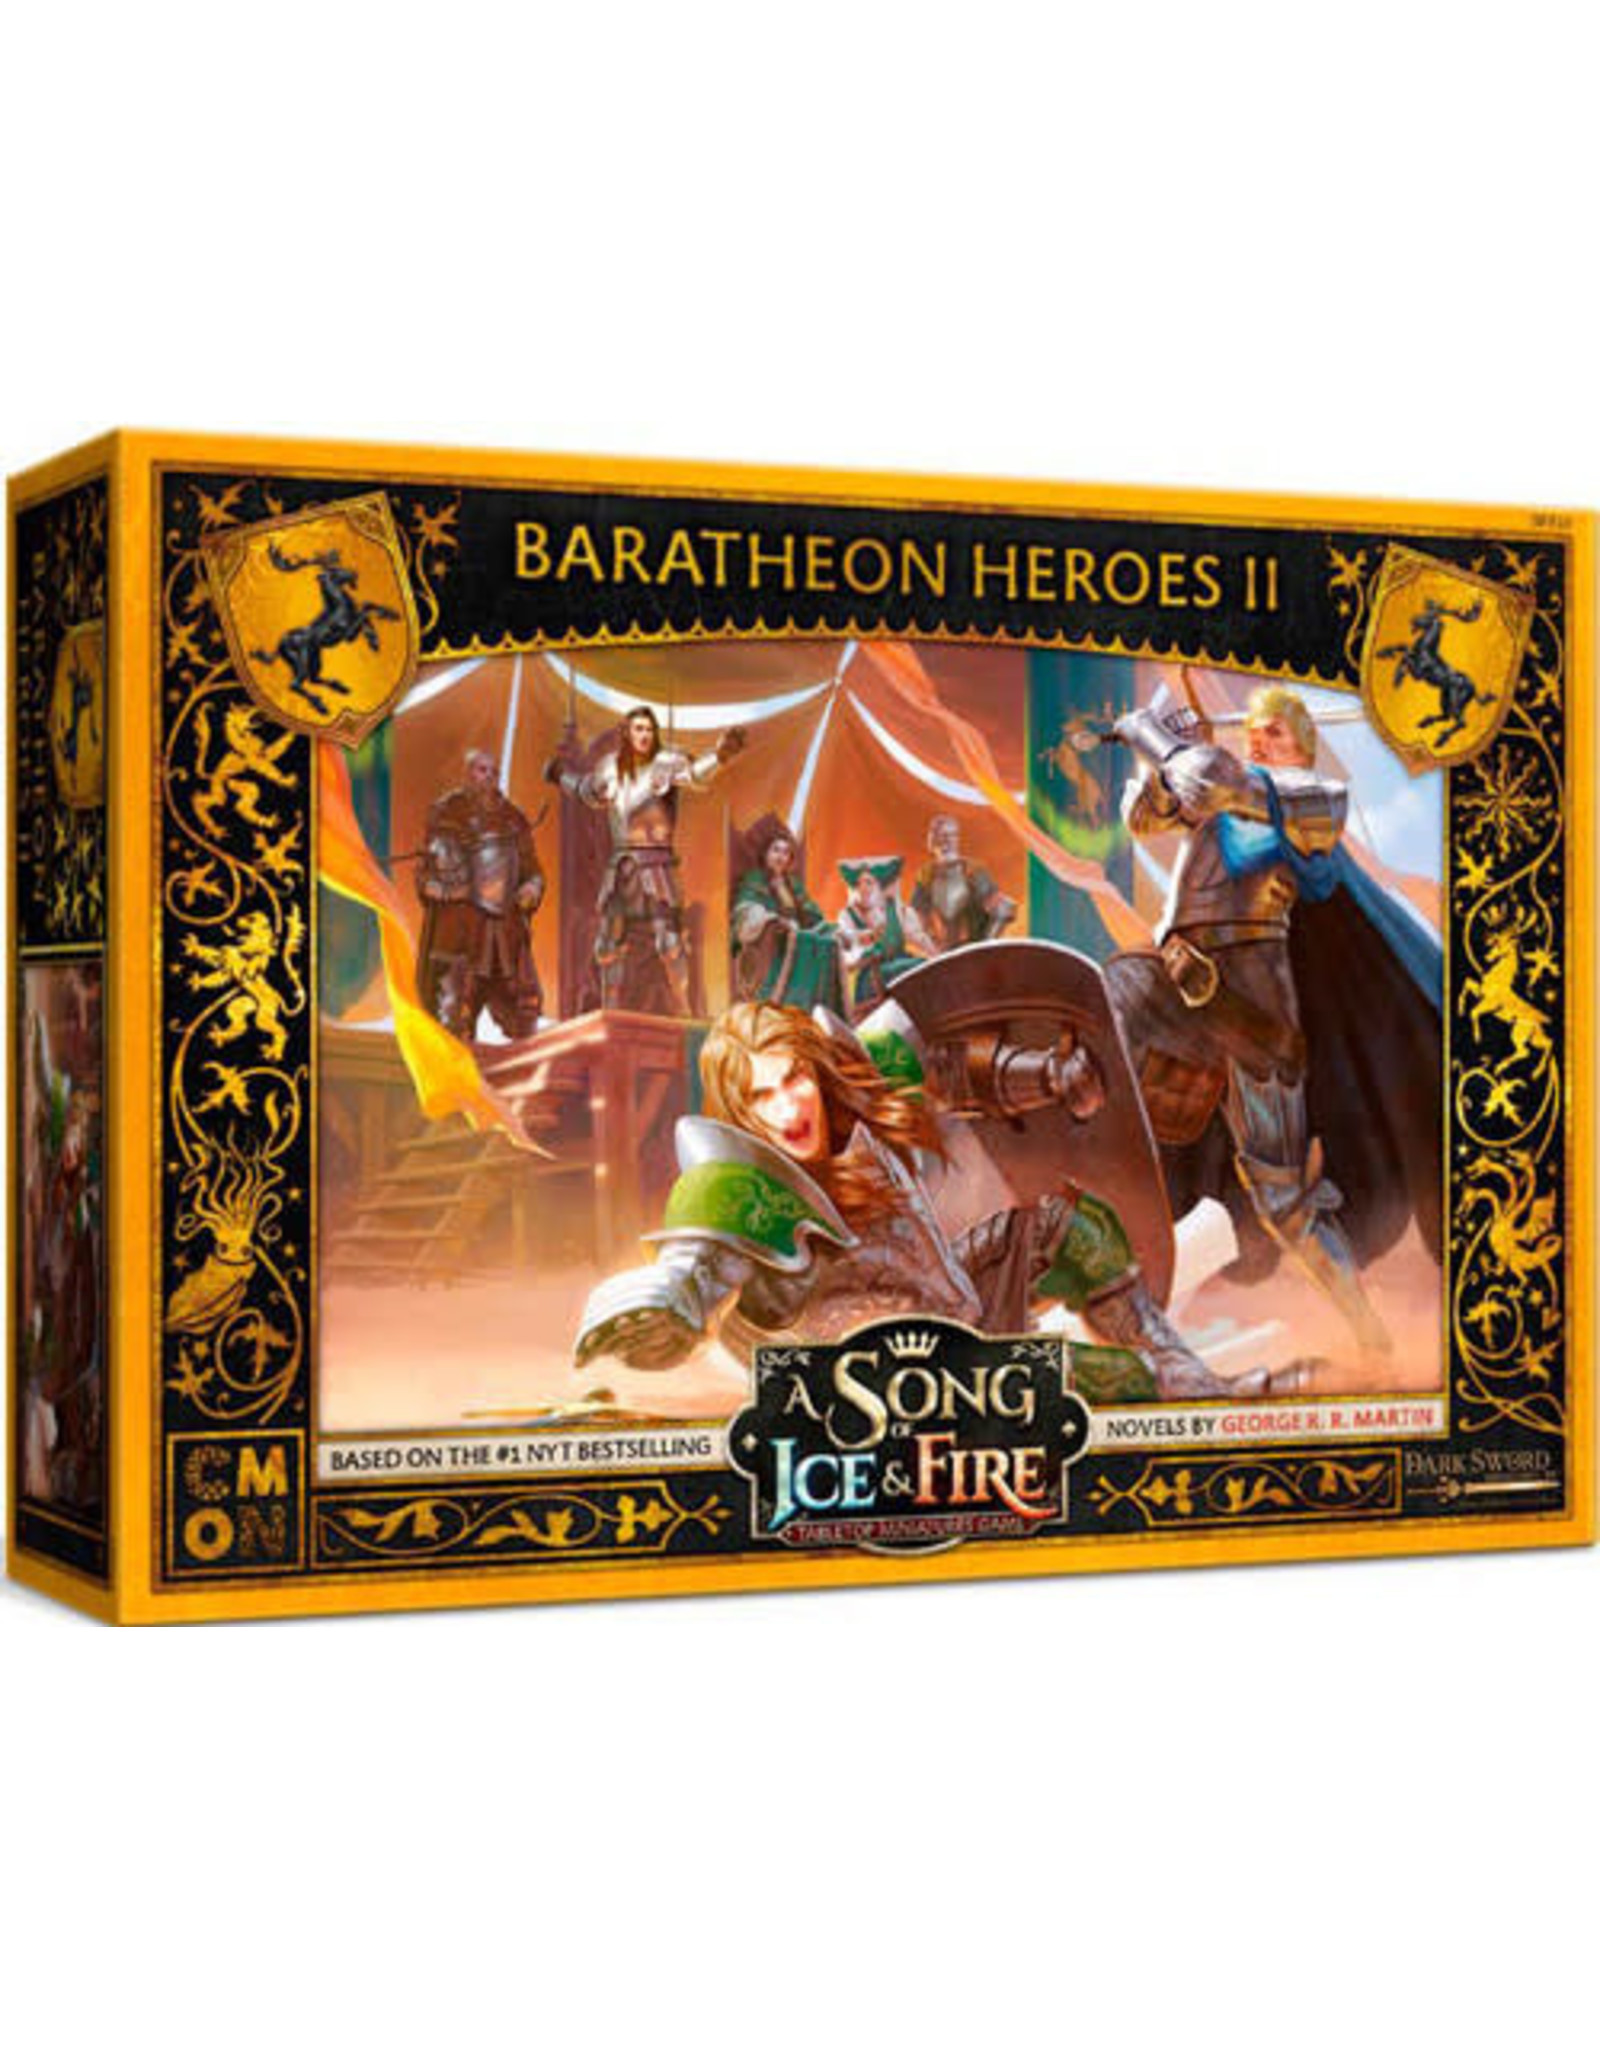 CMON A Song of Ice & Fire: Baratheon Heroes II